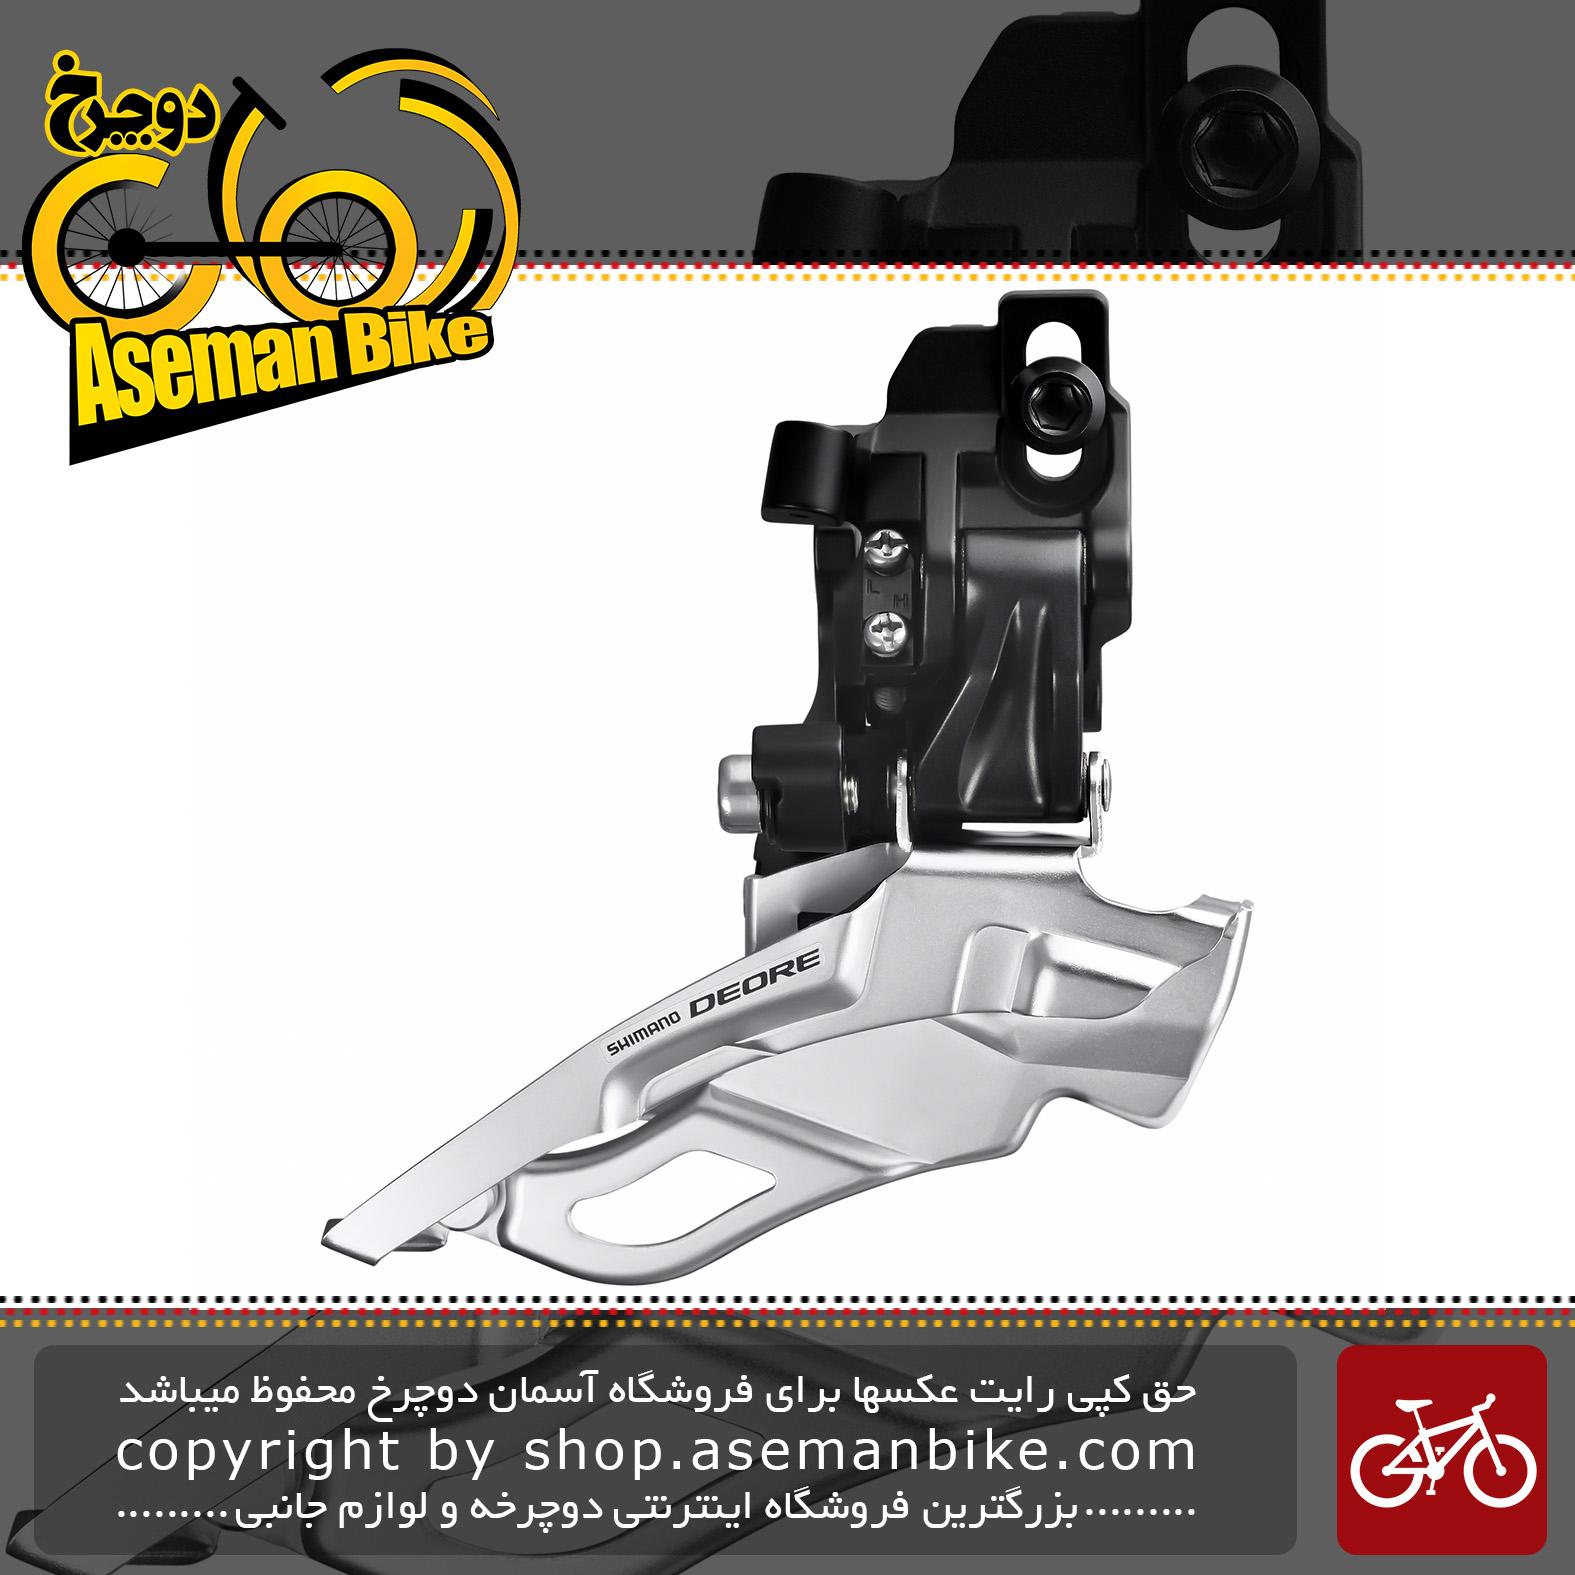 طبق عوض کن دوچرخه شیمانو دیور Shimano DEORE FD-M611-D Down Swing Front Derailleur (3x10-speed)